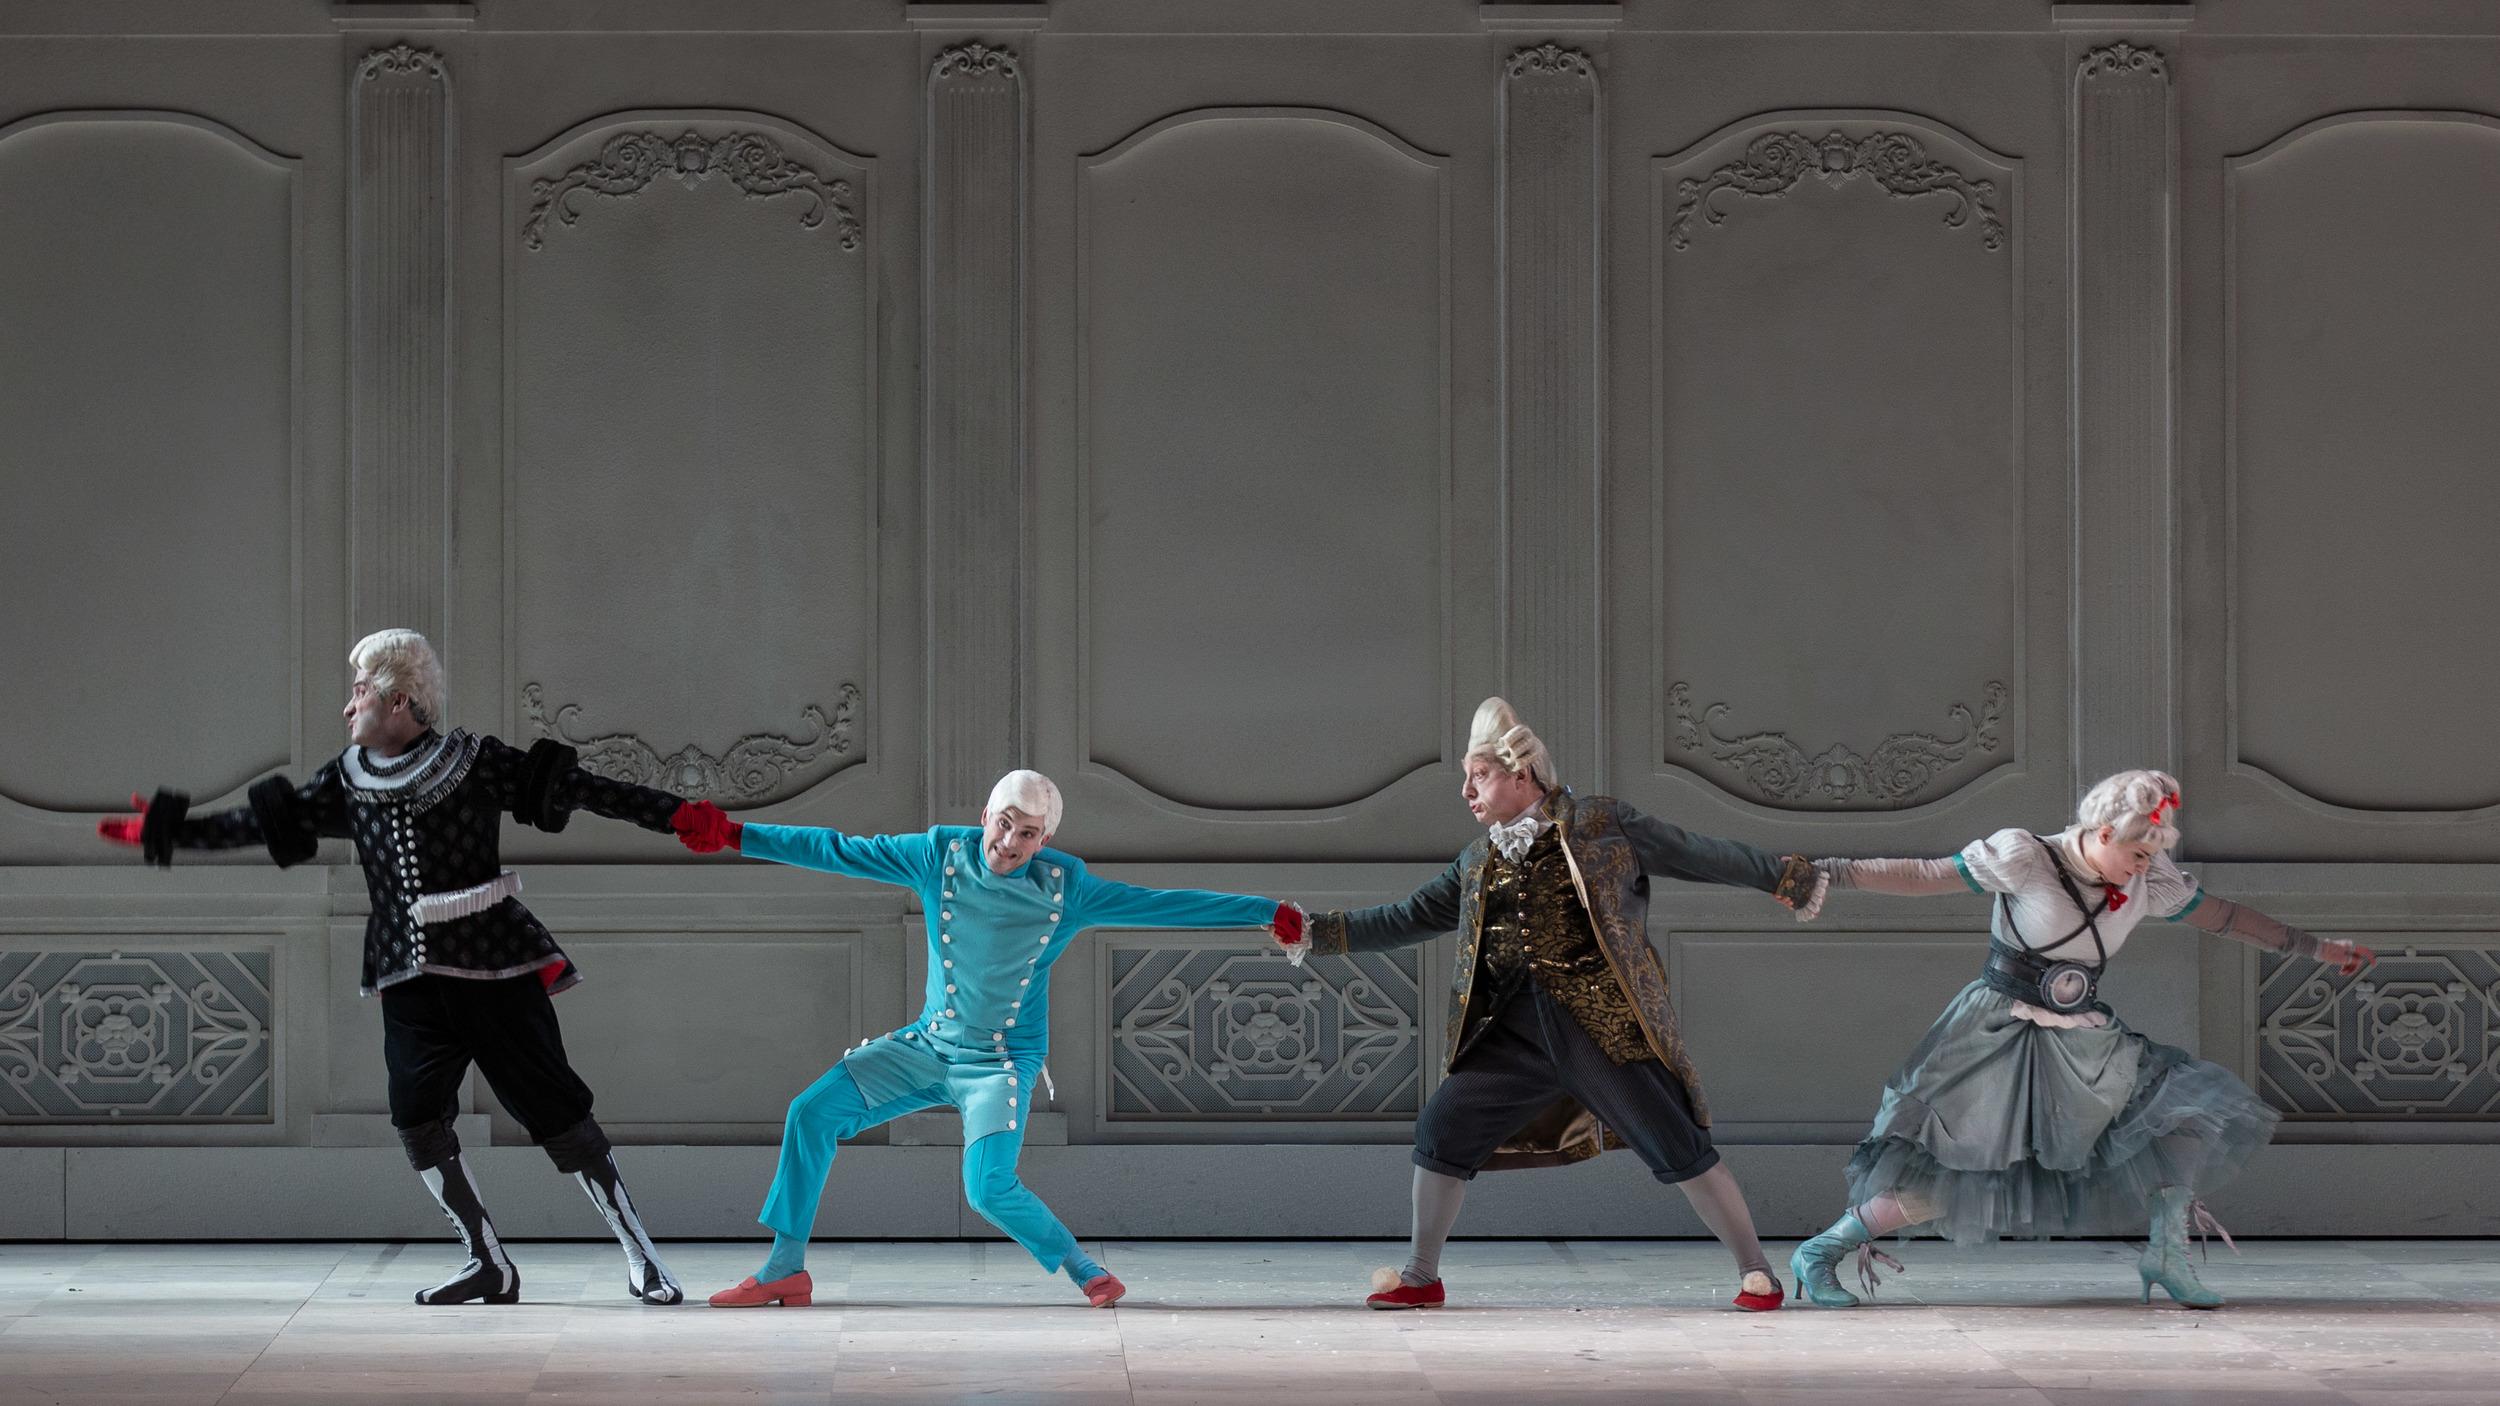 Gioacchino-Rossini-La-Cenerentola-regia-Emma-Dante-®Yasuko-Kageyama-Opera-di-Roma-2015-16-3.jpg